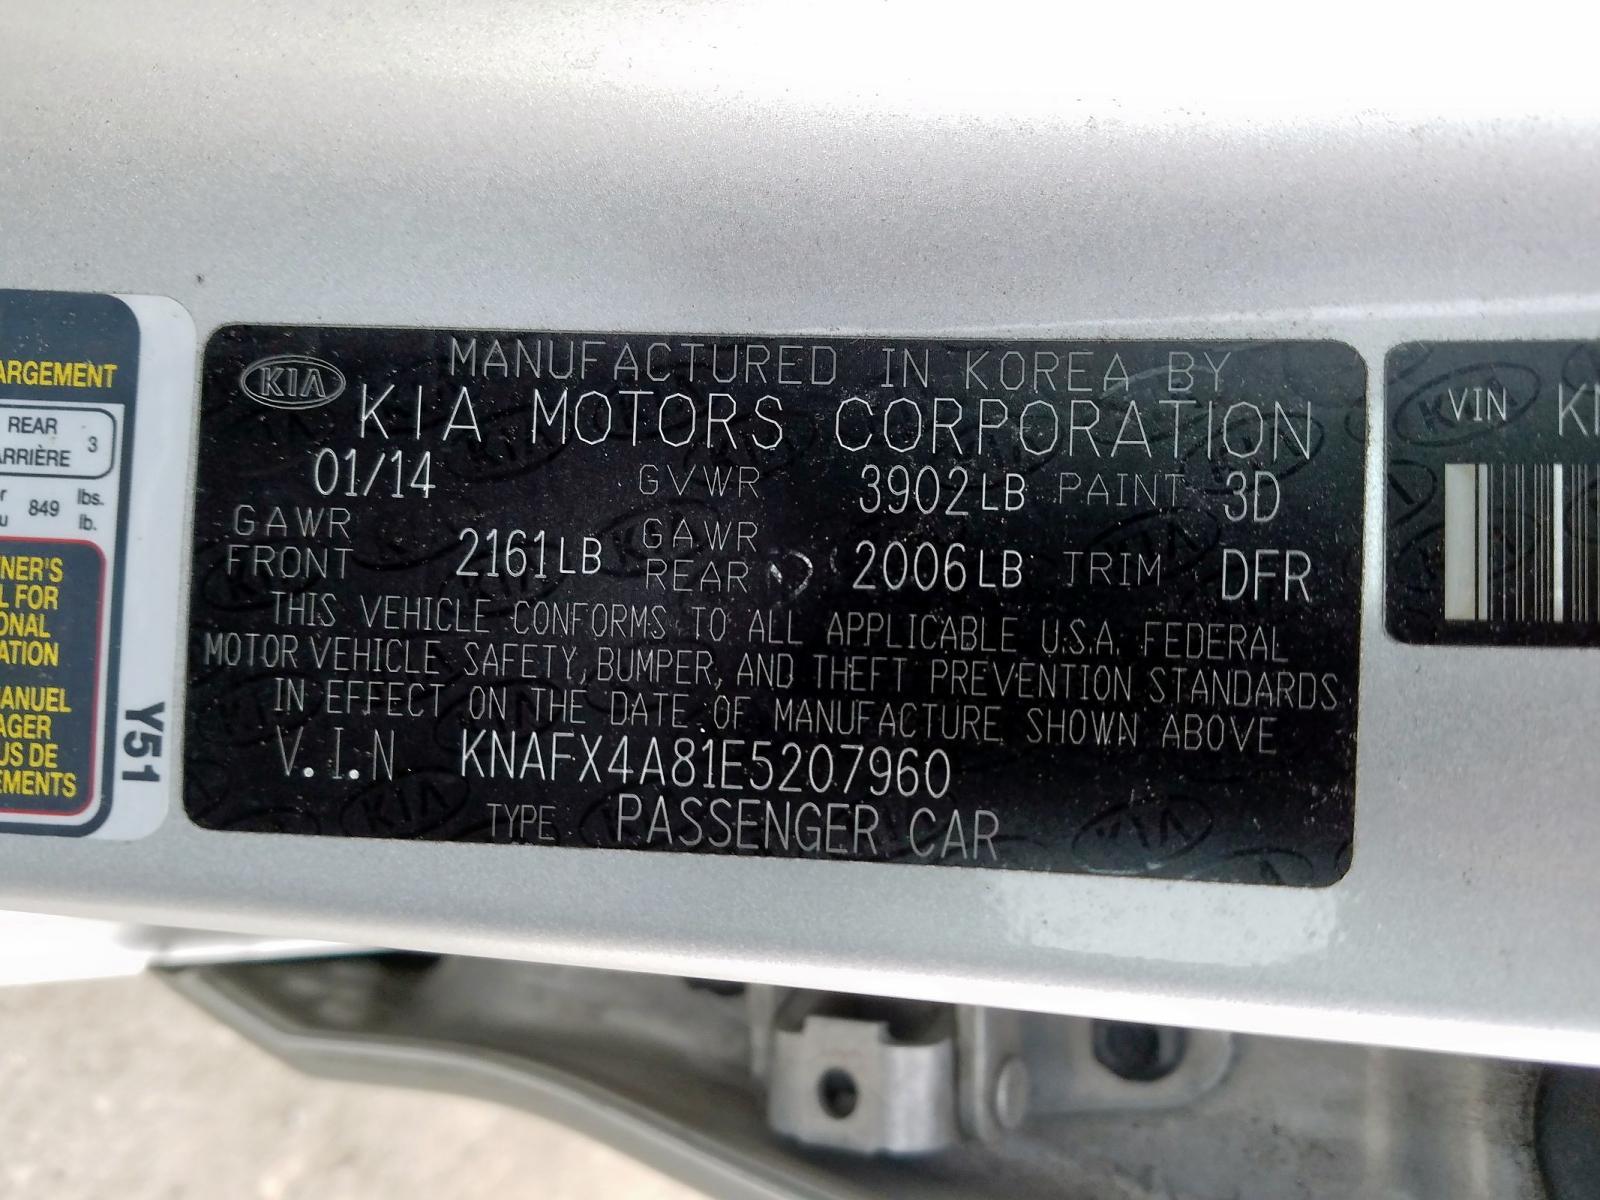 KNAFX4A81E5207960 - 2014 Kia Forte Ex 2.0L